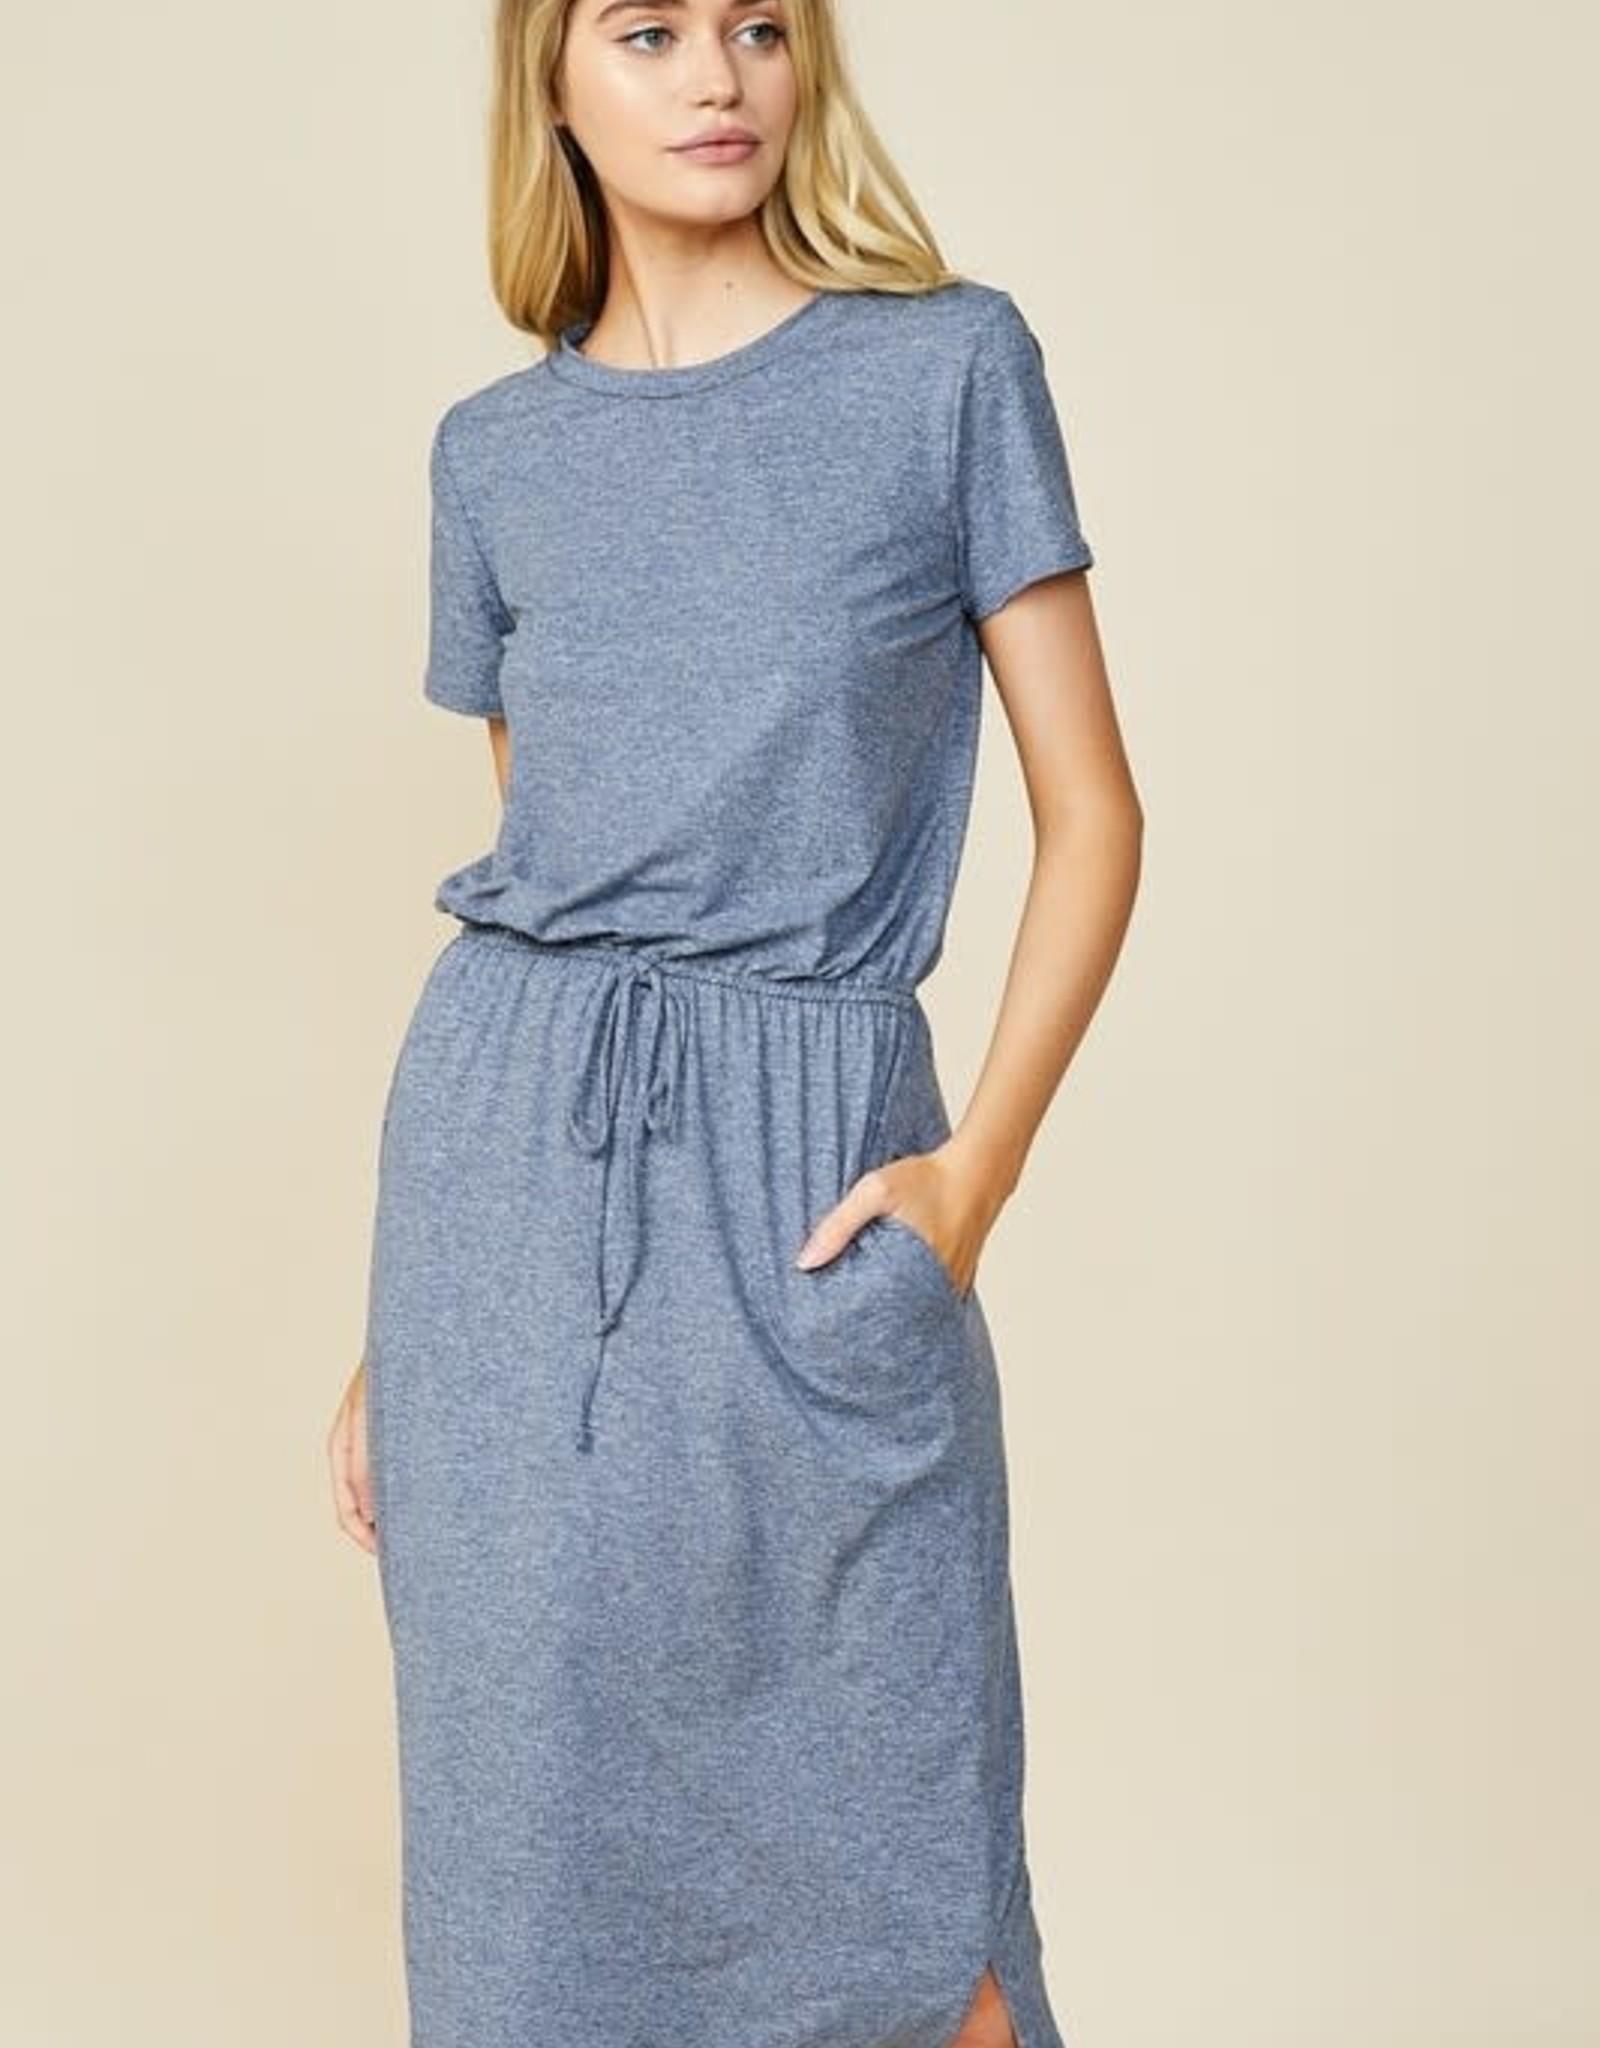 Heather Short Sleeve Dress